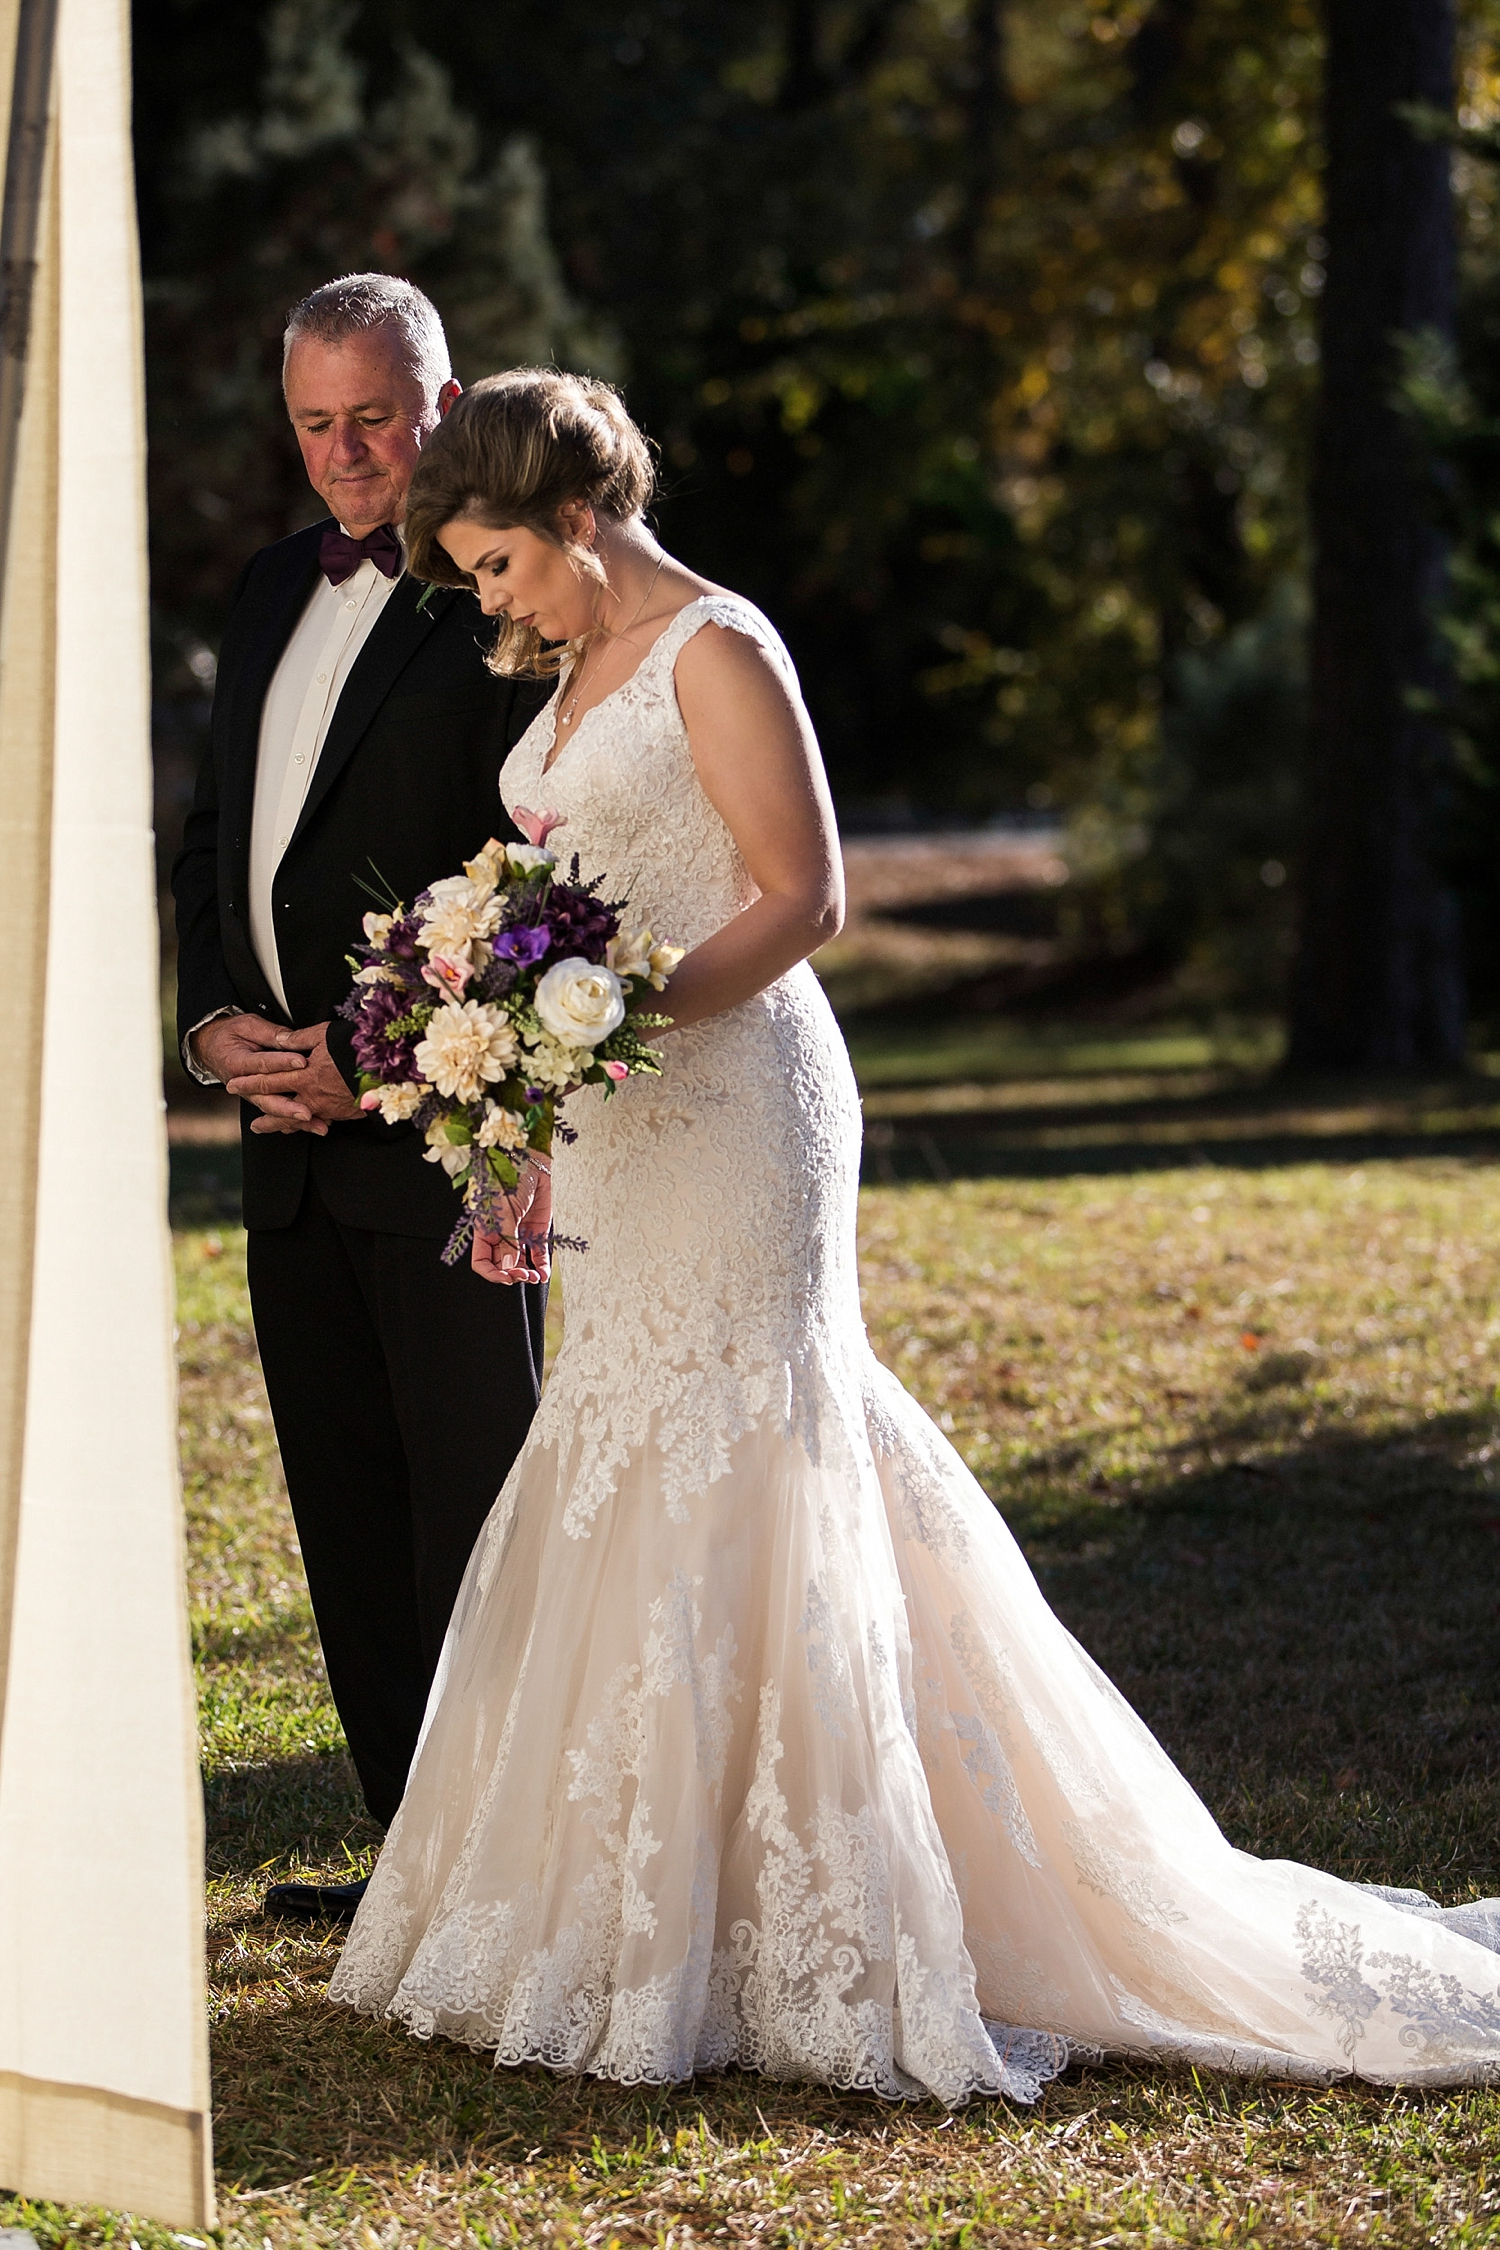 424_kayla_allen-wedding.jpg